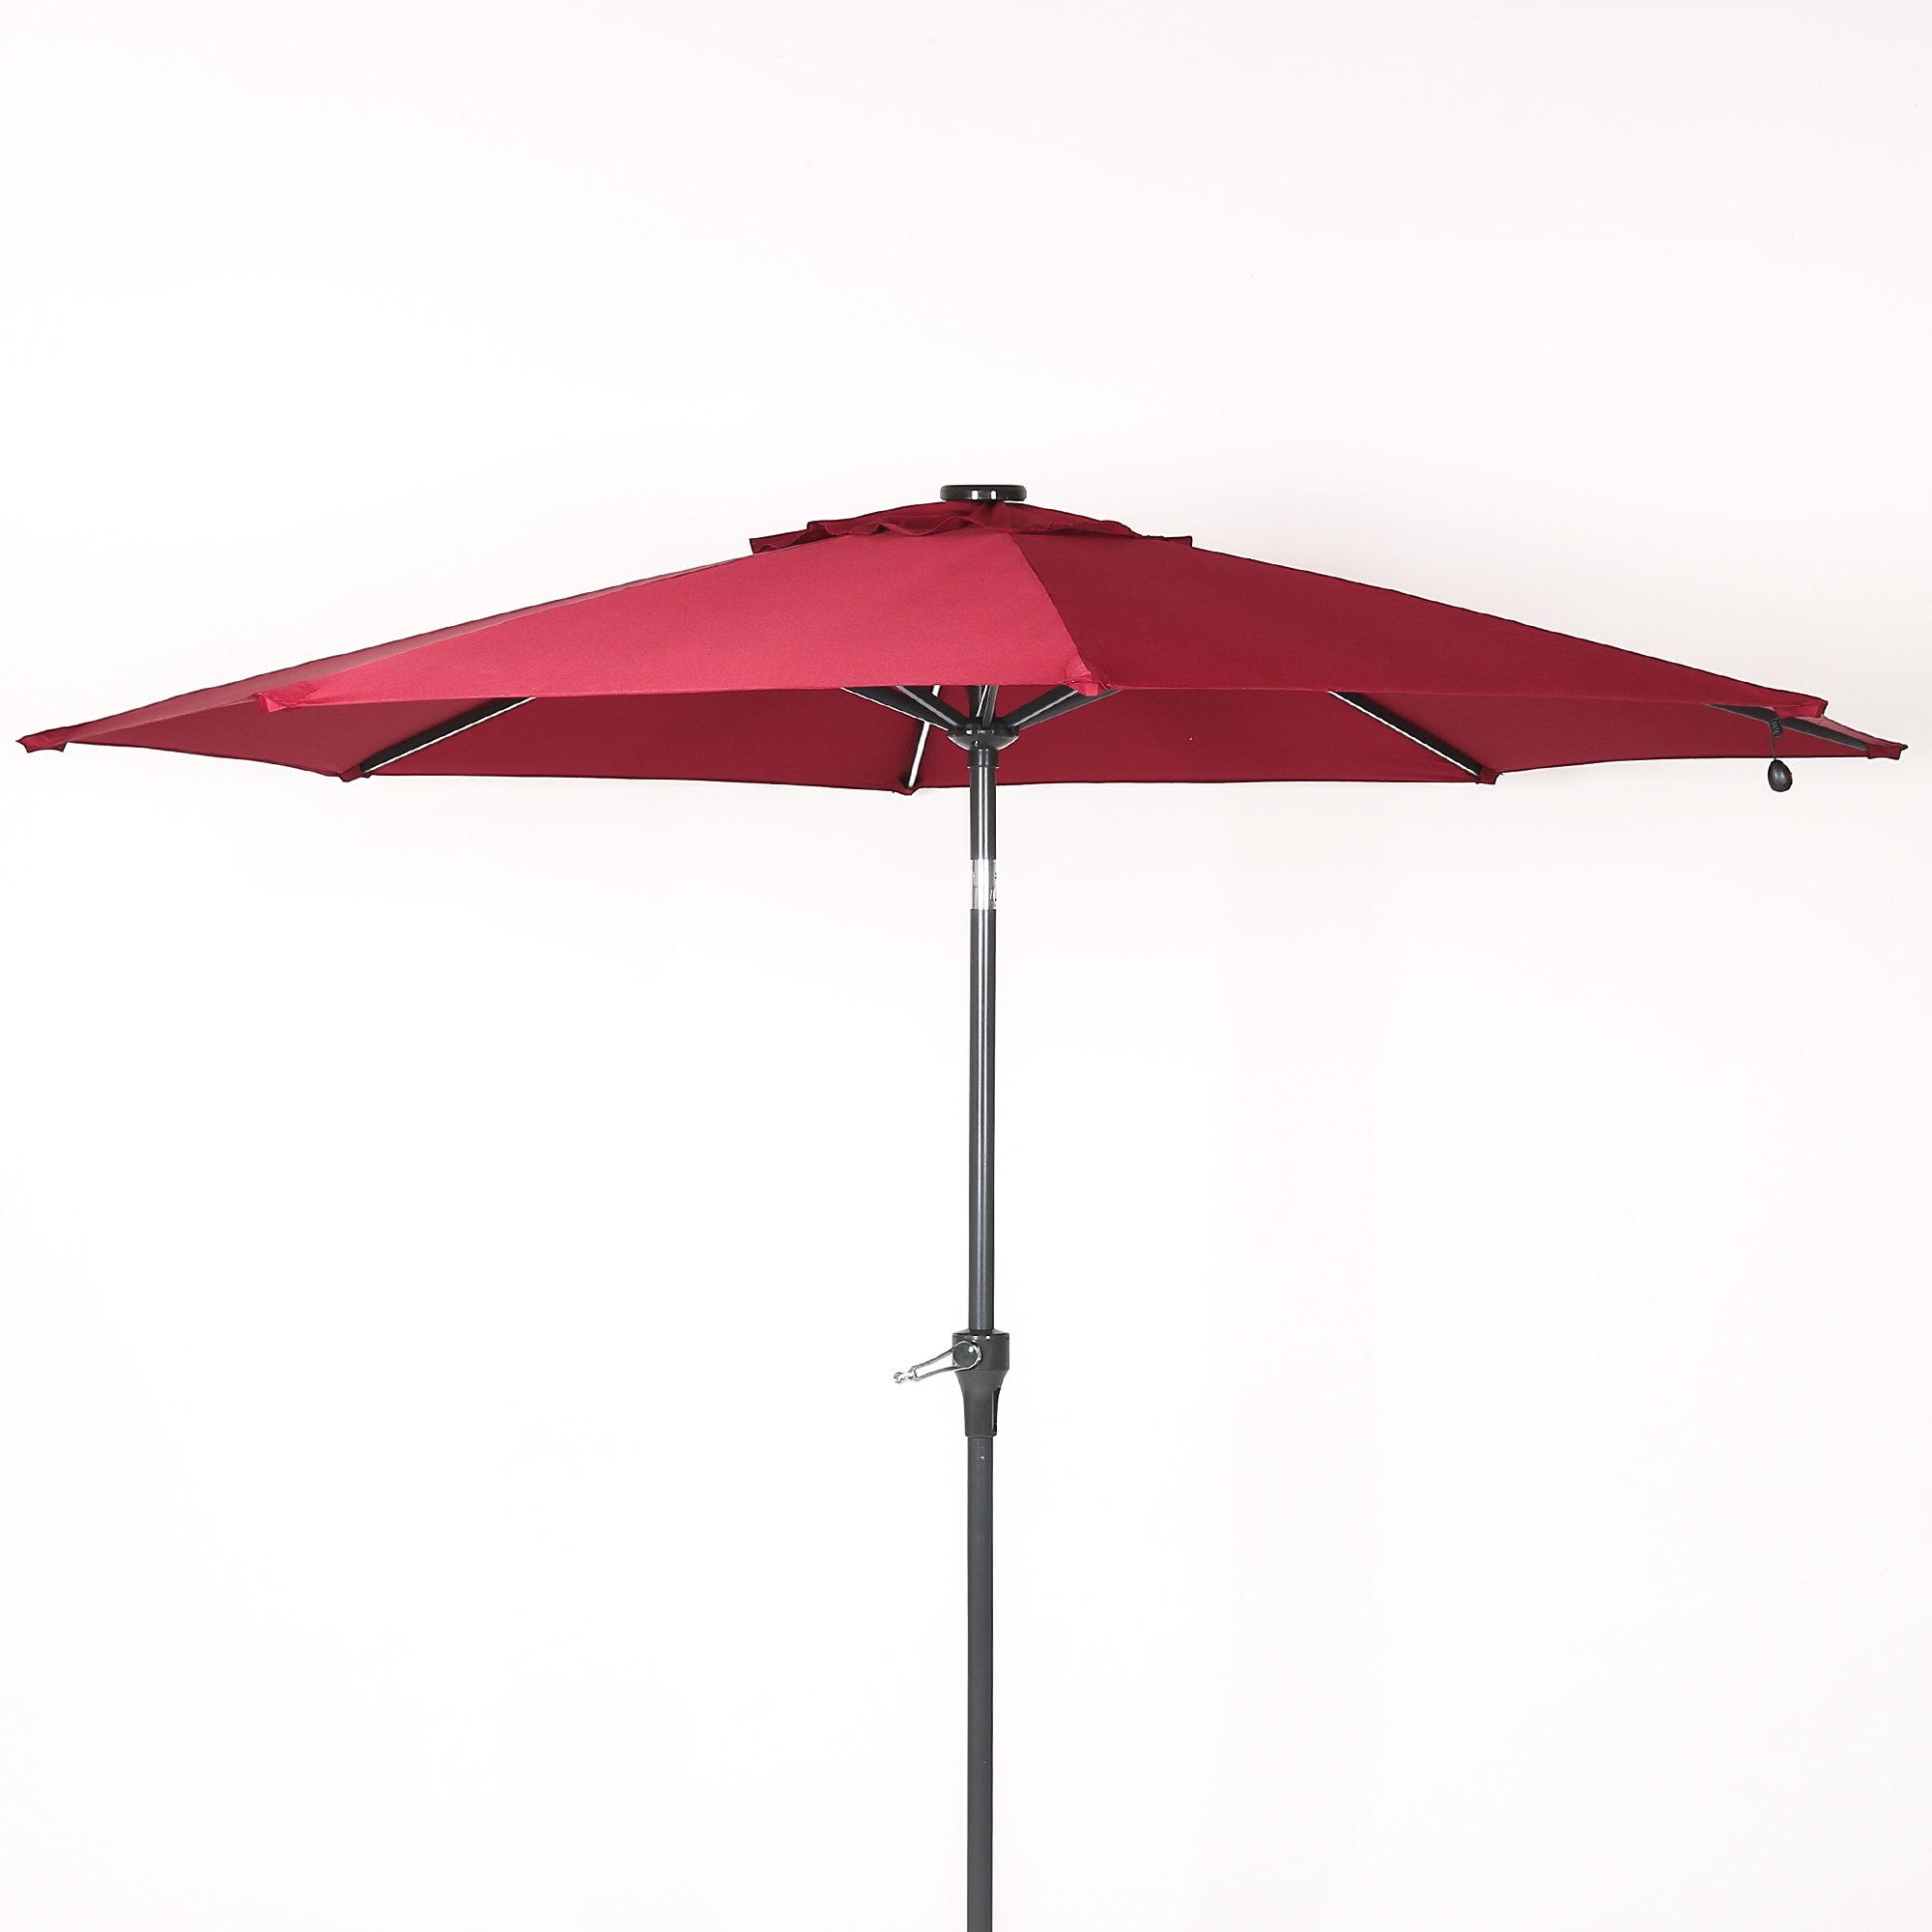 Olszewski 9' Market Umbrella Pertaining To 2019 Branscum Lighted Umbrellas (View 15 of 20)